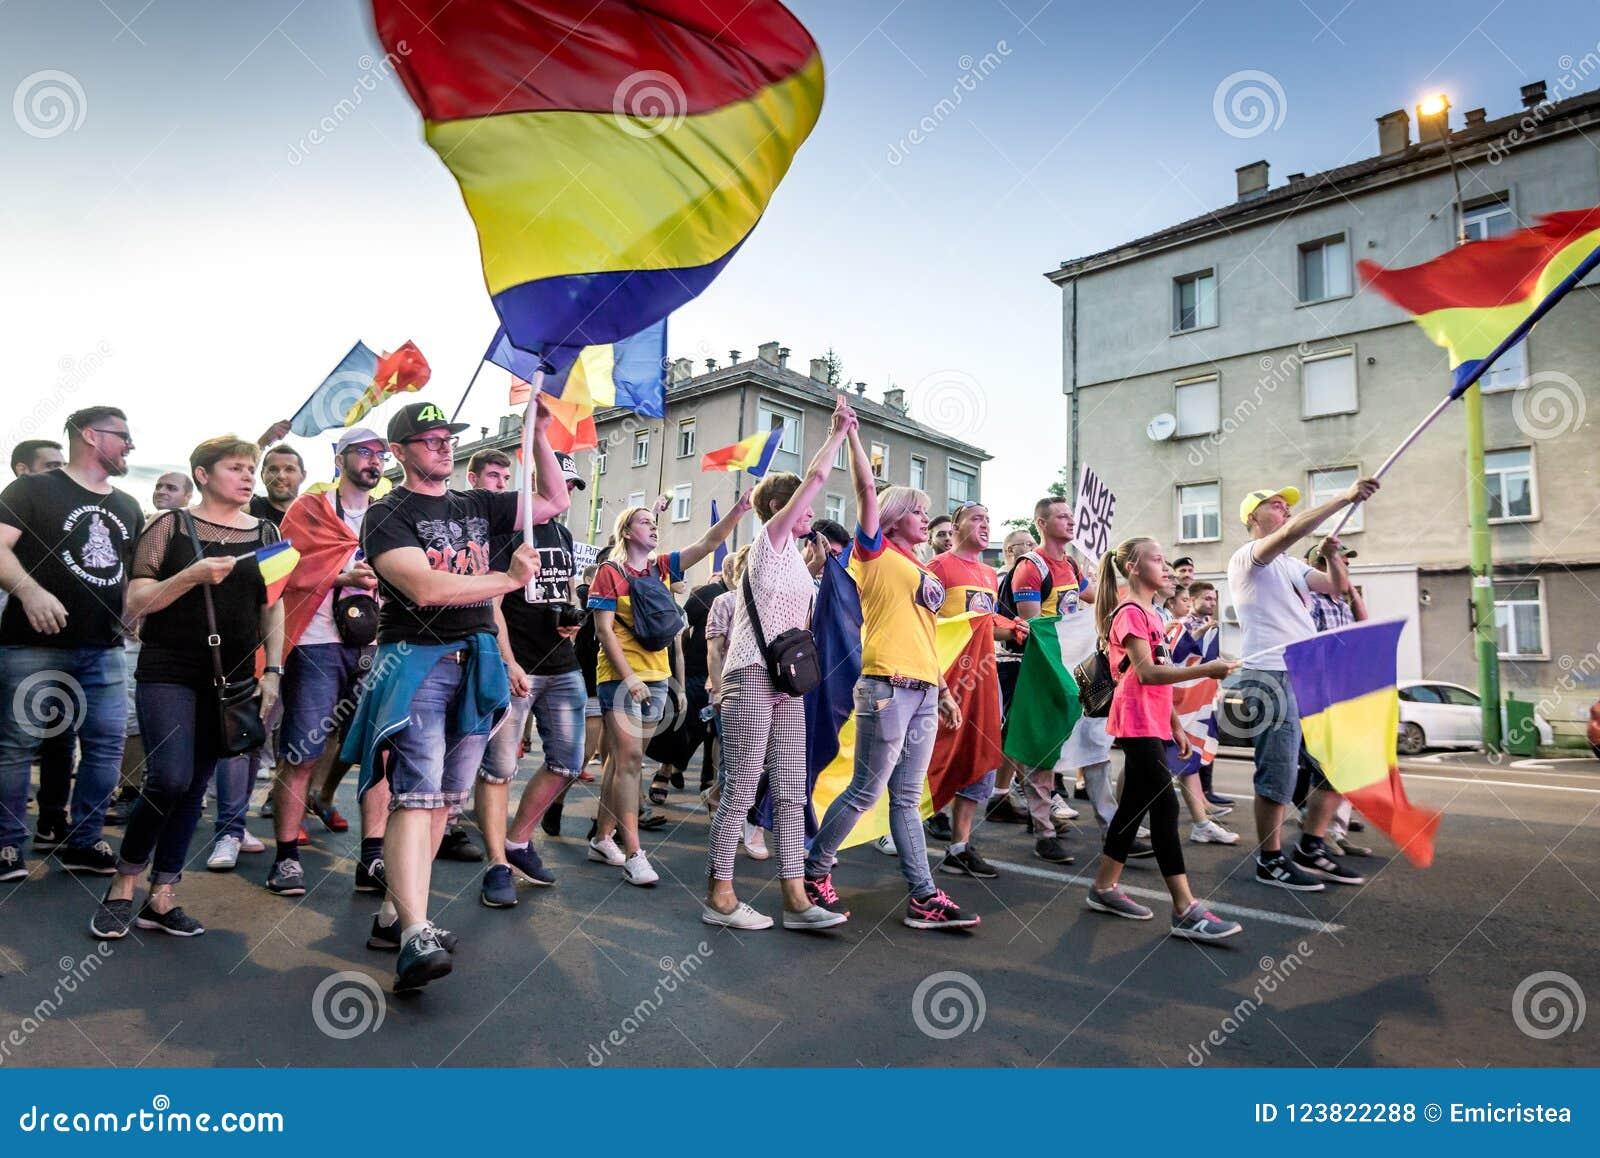 Brasov κεντρική πόλη παλαιά Ρου&m Ρουμάνοι διαμαρτύρονται ενάντια στο gover